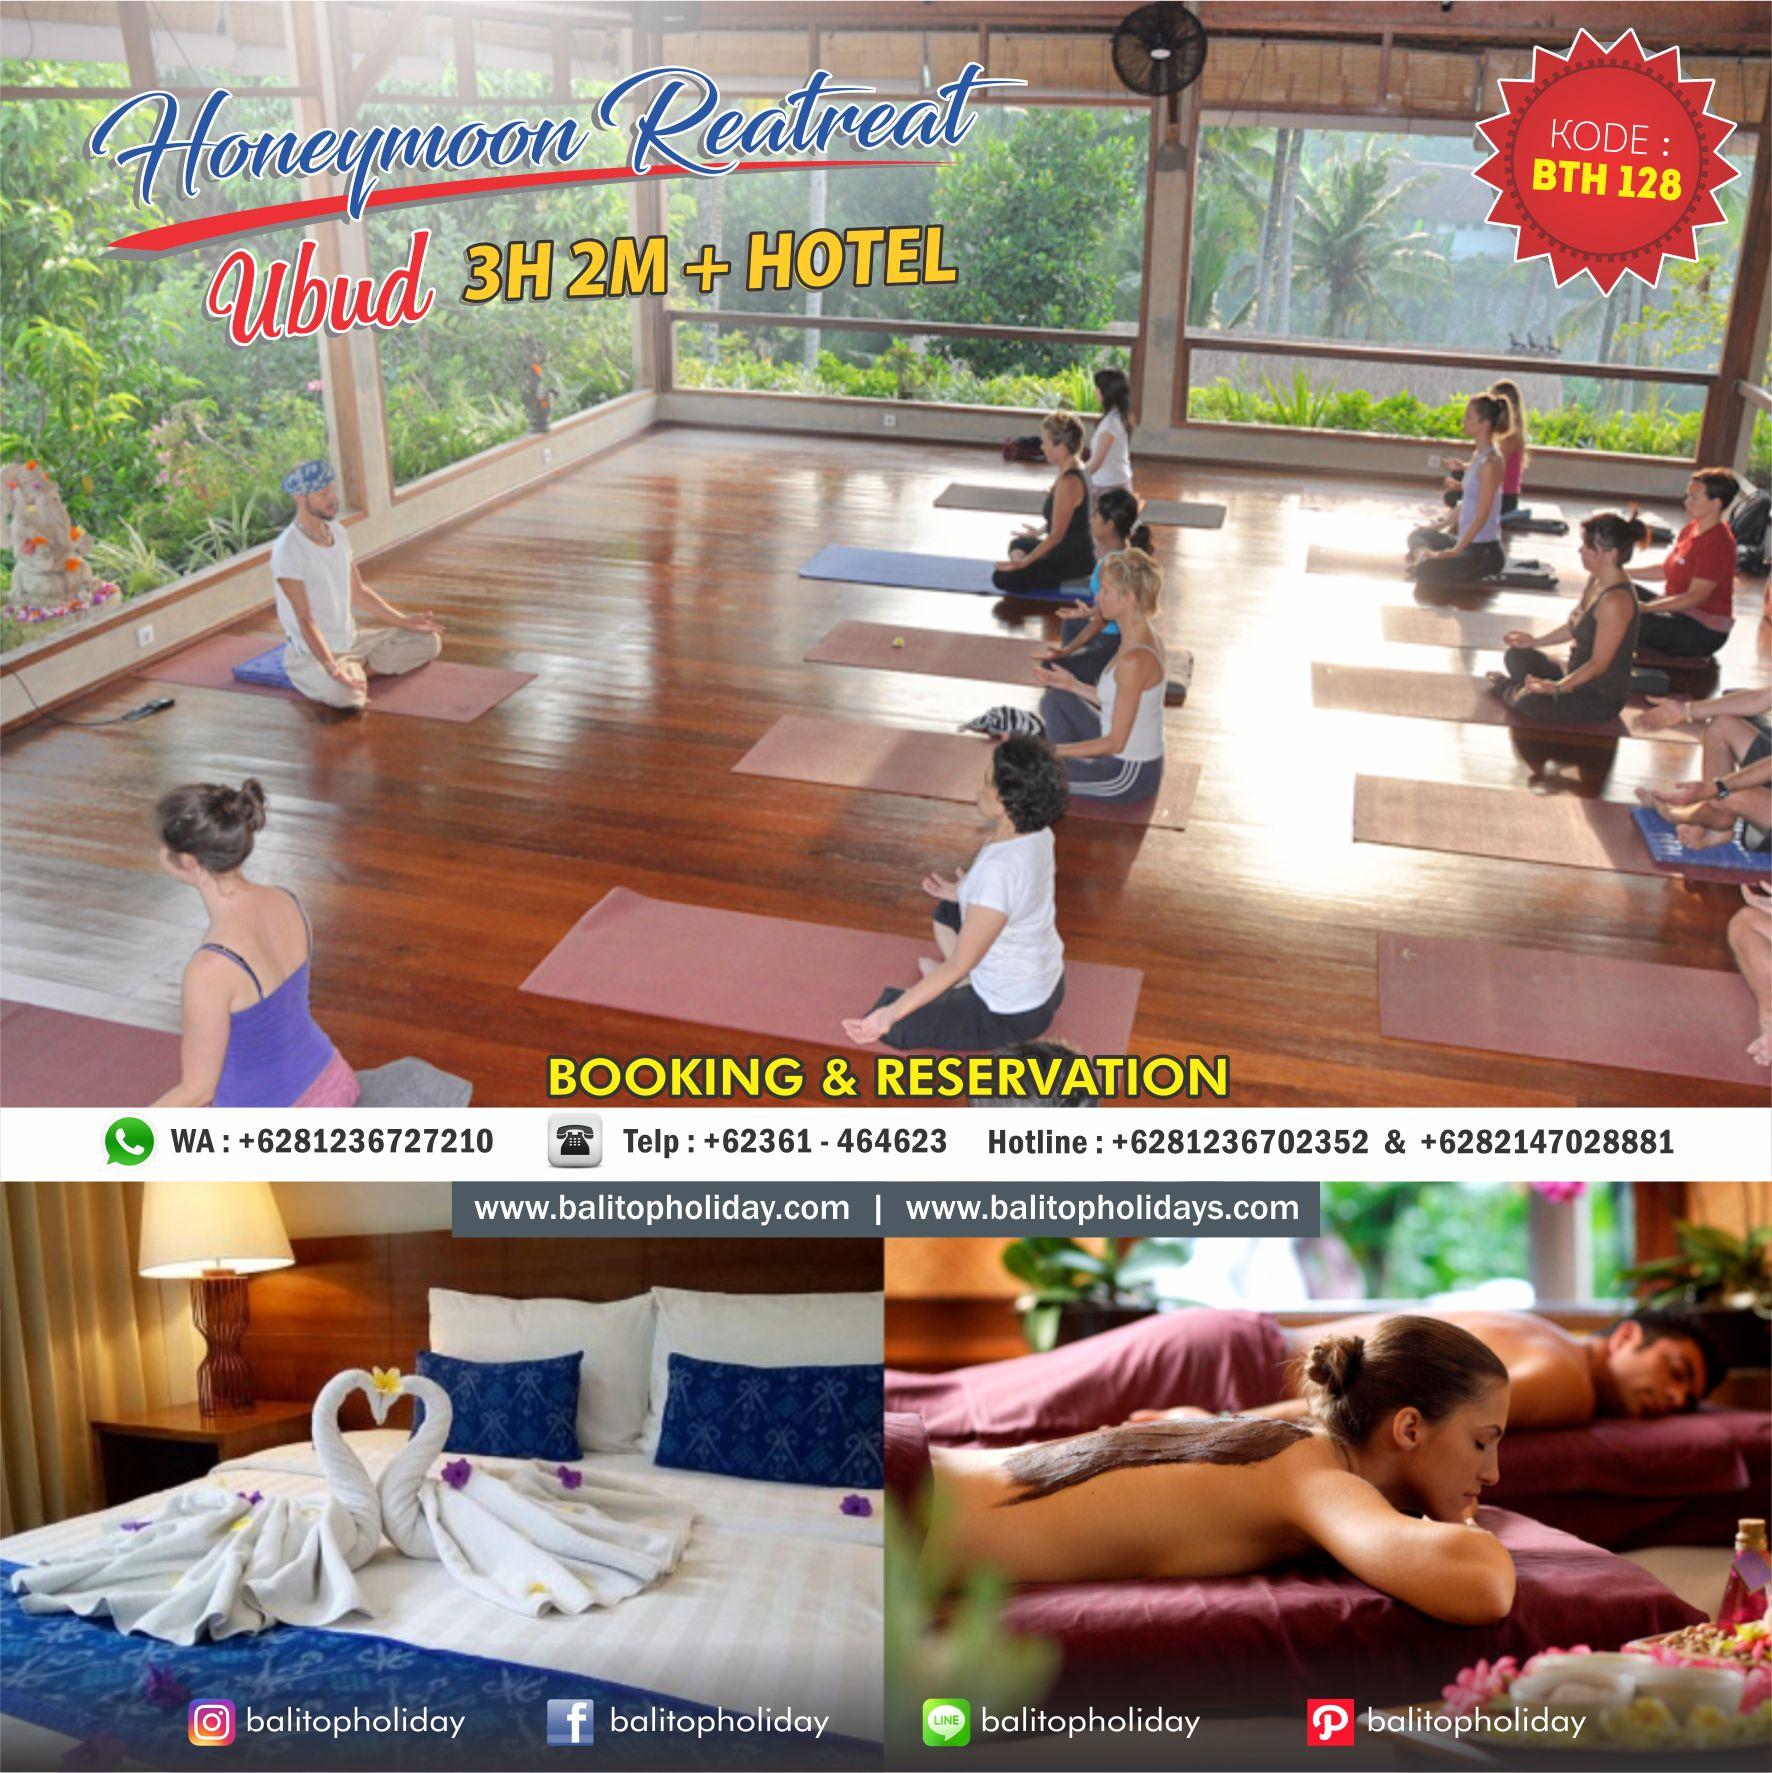 Paket Honeymoon Bali Ubud Retreat